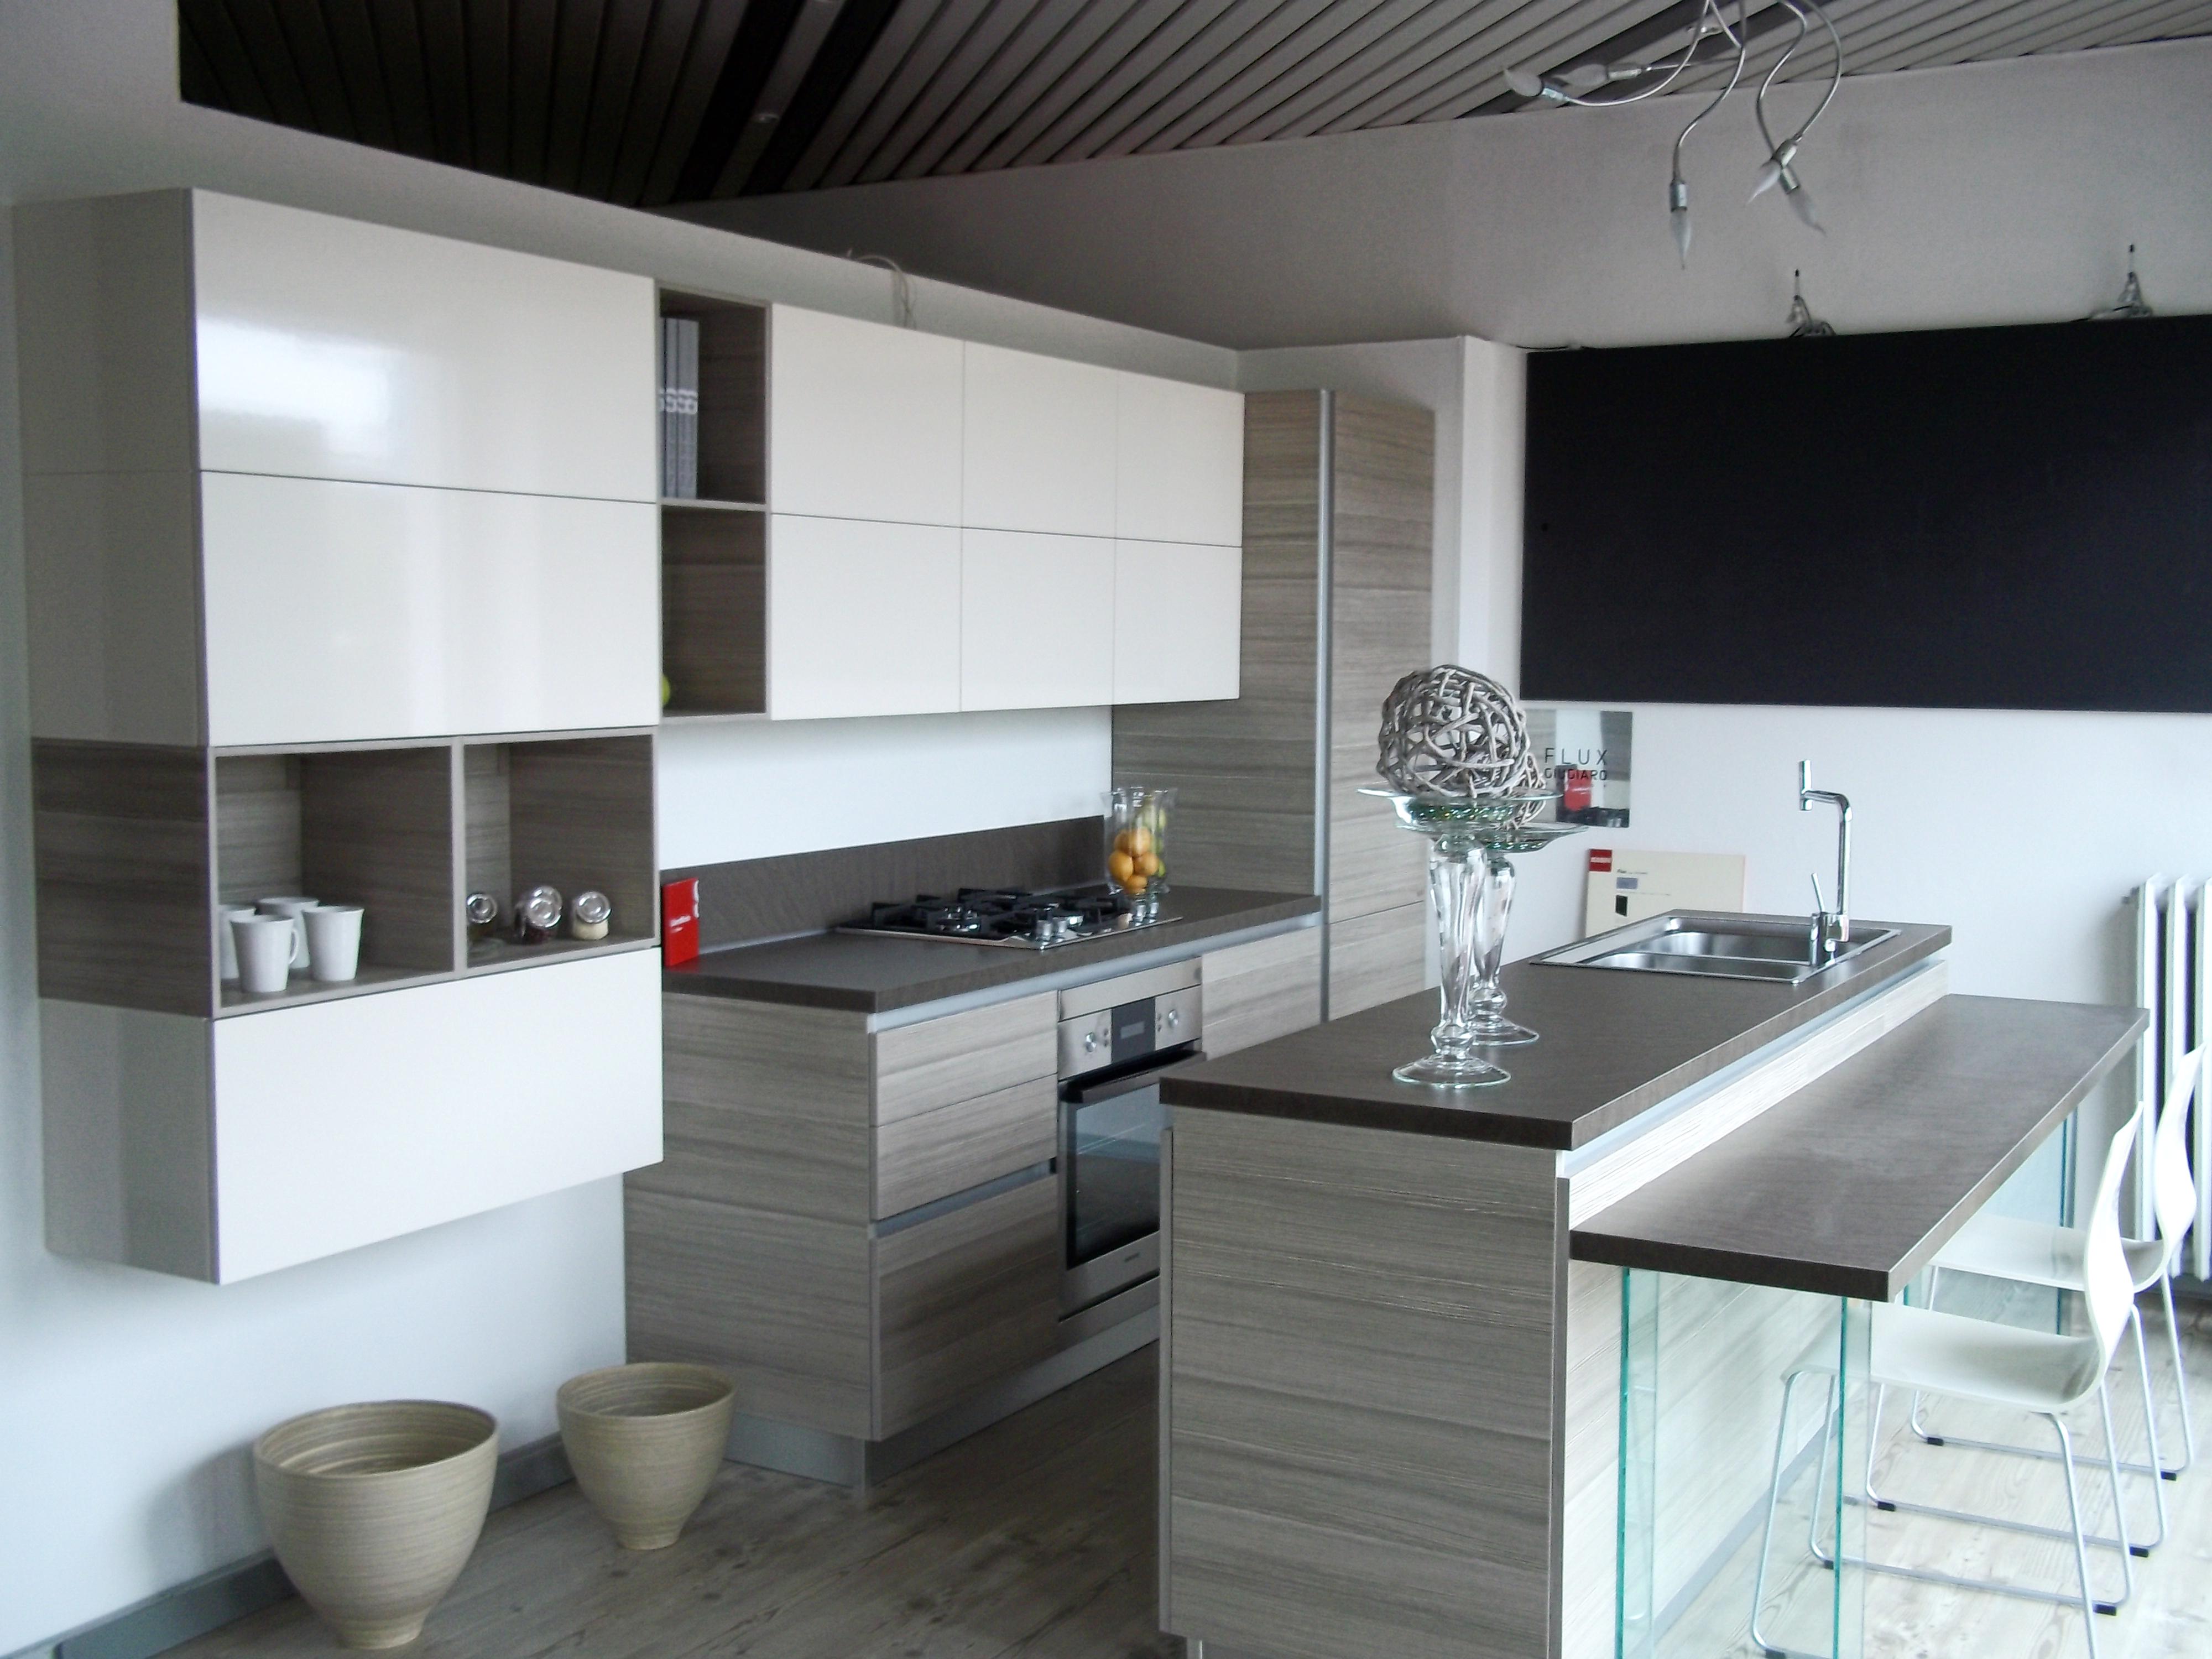 Stunning Cucine Bianche Scavolini Images - Ideas & Design 2017 ...